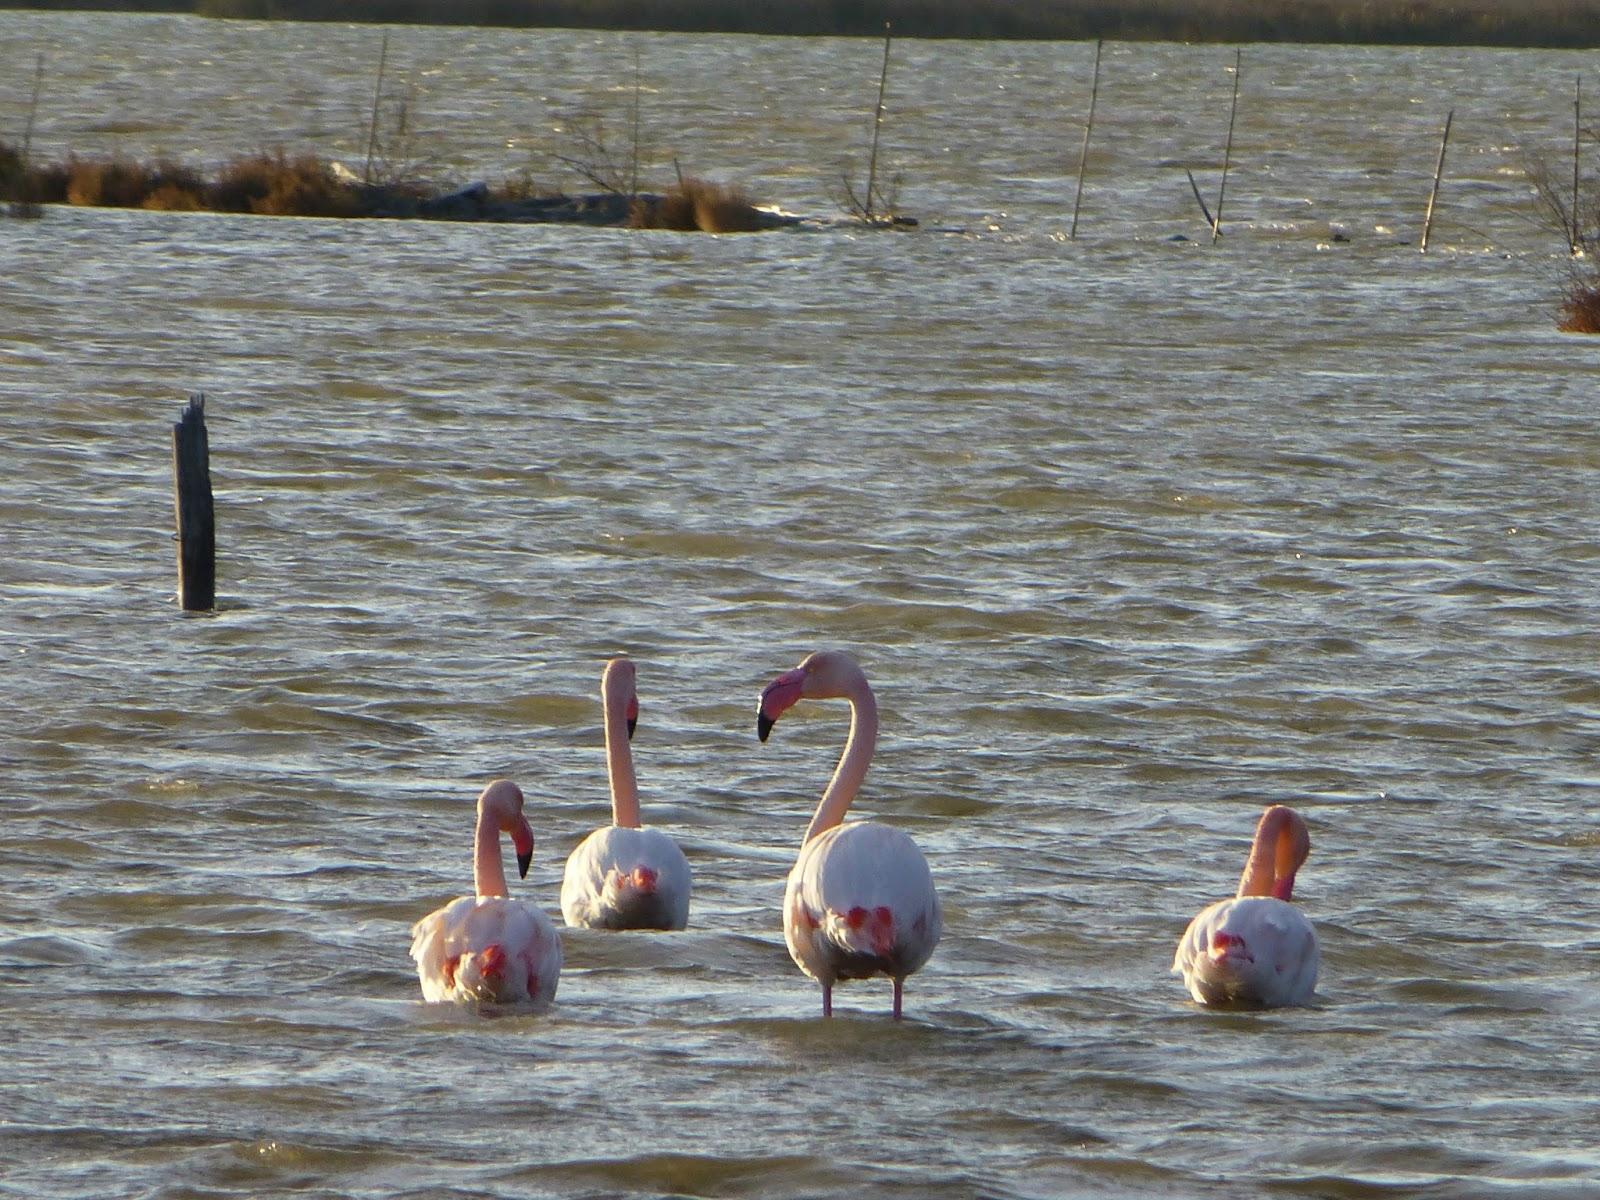 http://1.bp.blogspot.com/-97ytCVrBp60/UP0aHgj61DI/AAAAAAAAgsE/EVBHMwvqwEQ/s1600/flamingo1.jpg